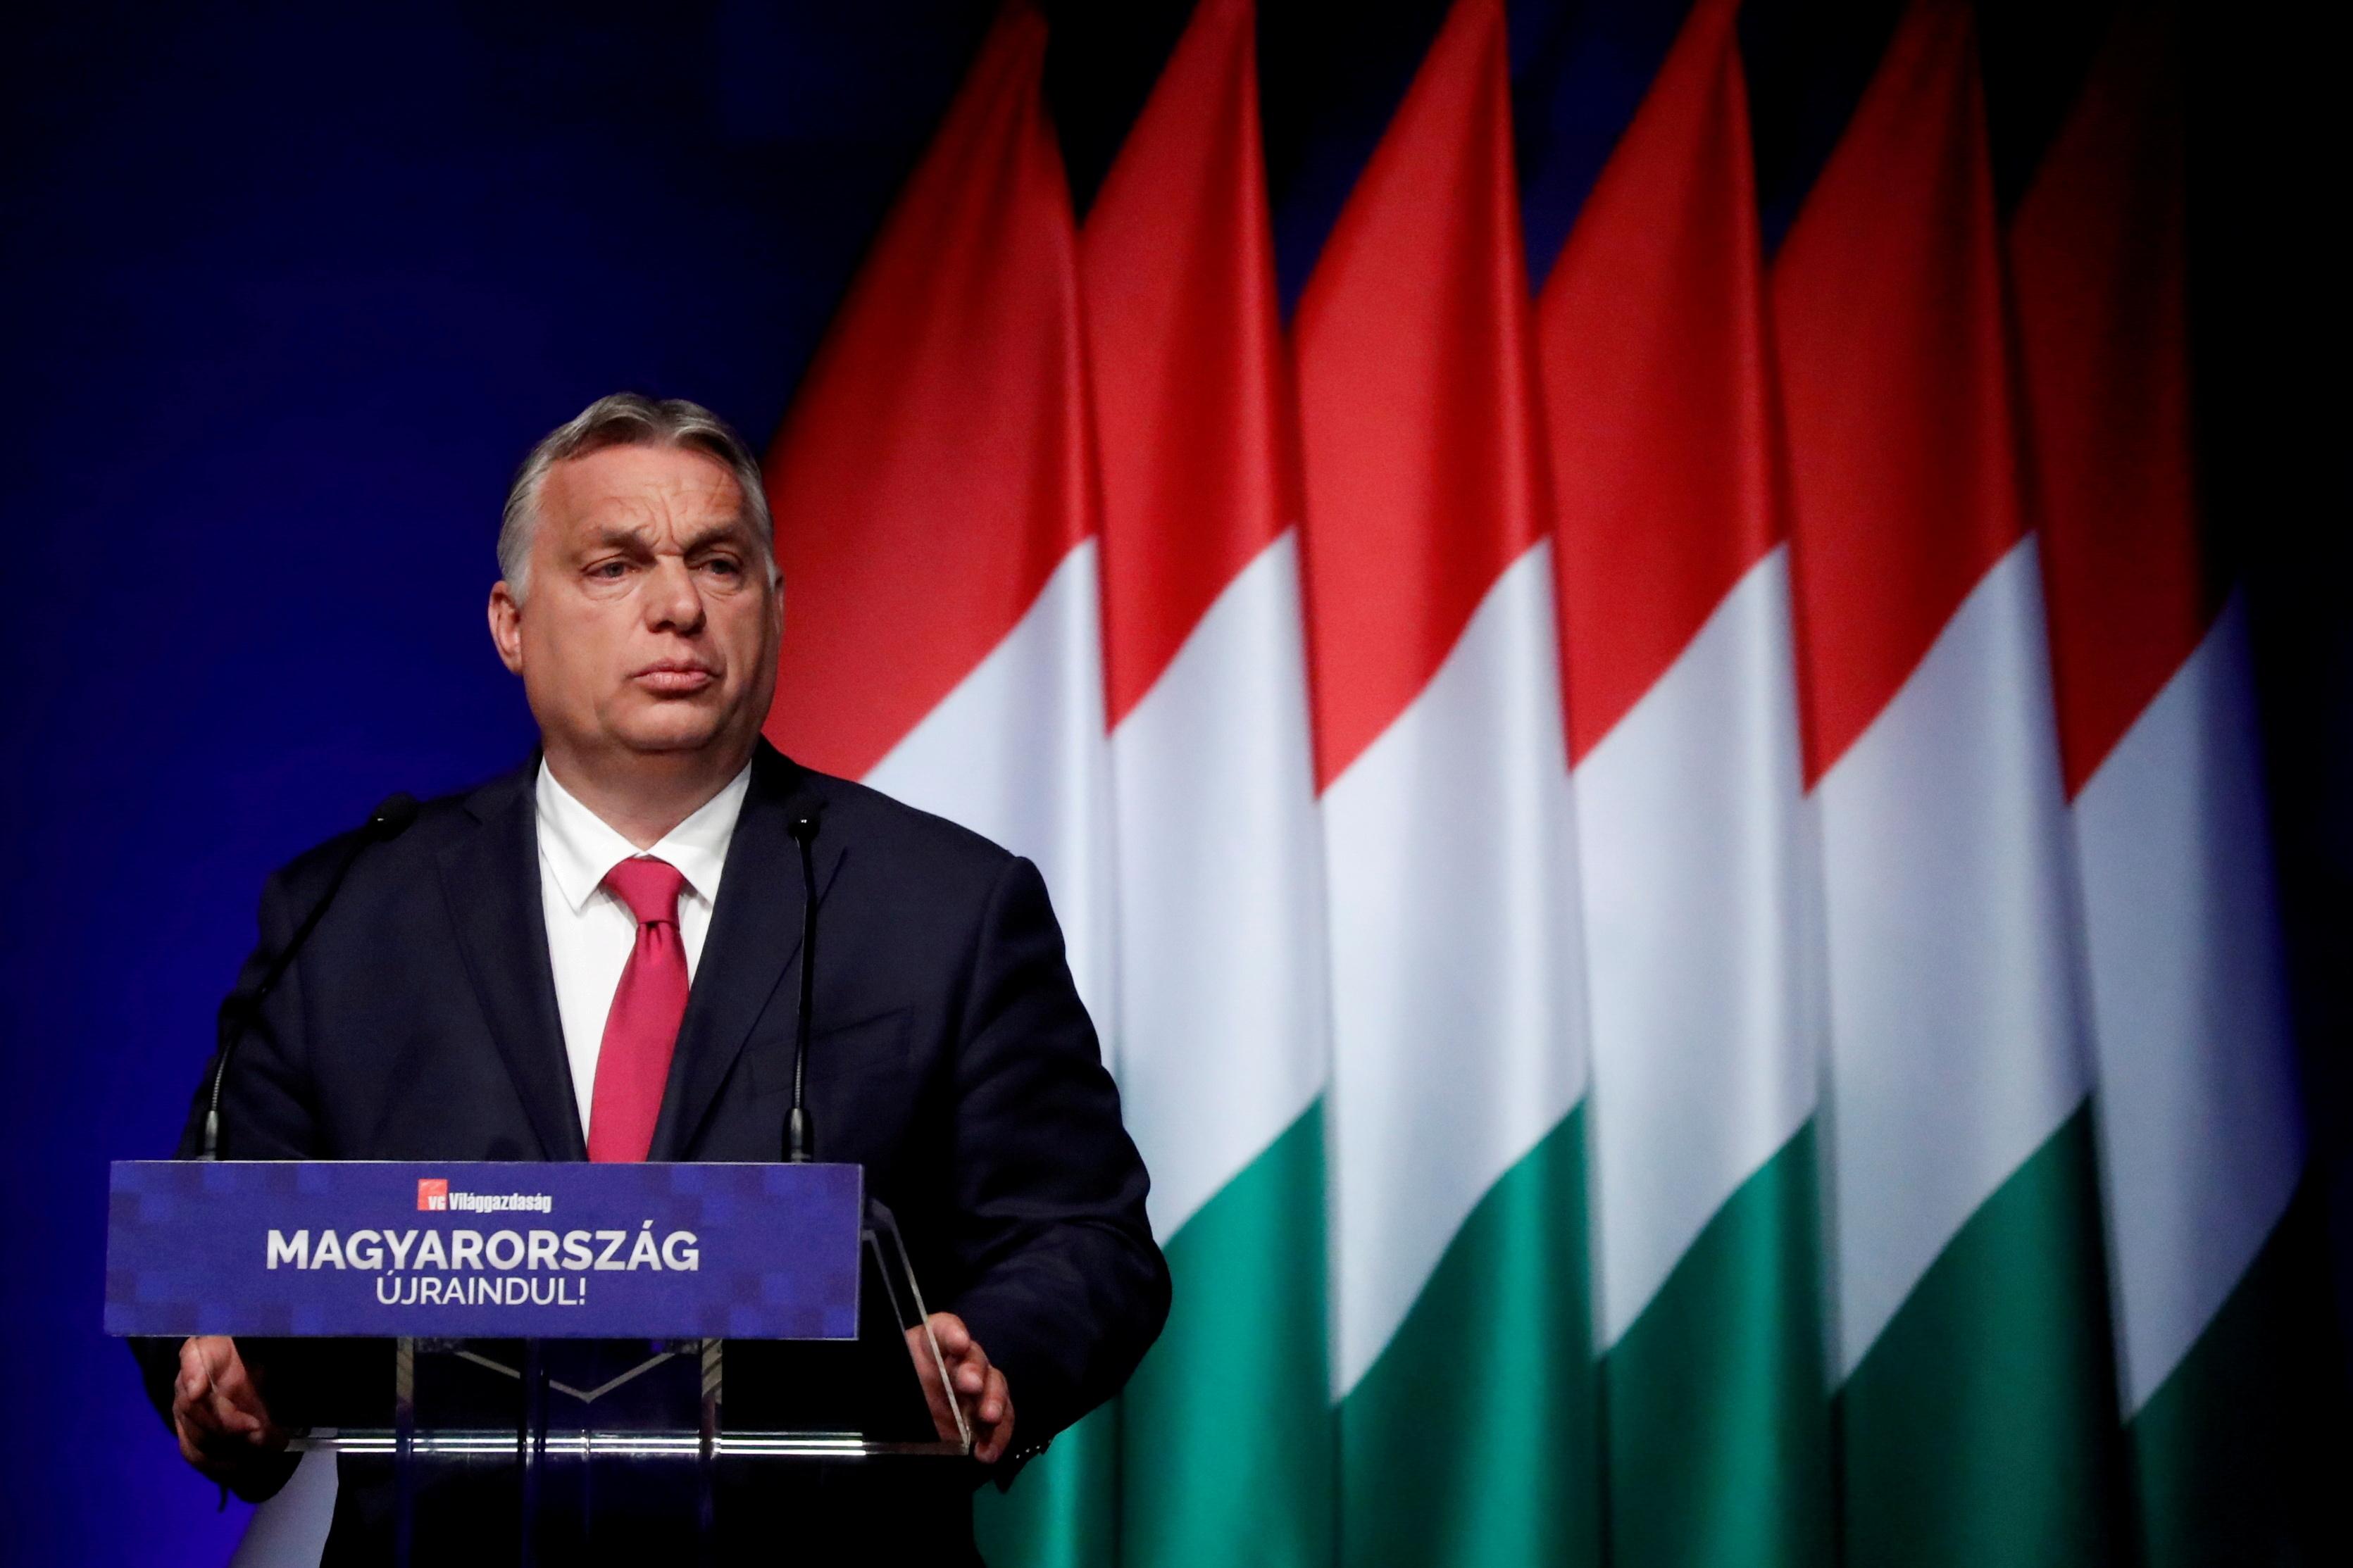 Hungarian Prime Minister Viktor Orban addresses a business conference in Budapest, Hungary, June 9, 2021. REUTERS/Bernadett Szabo